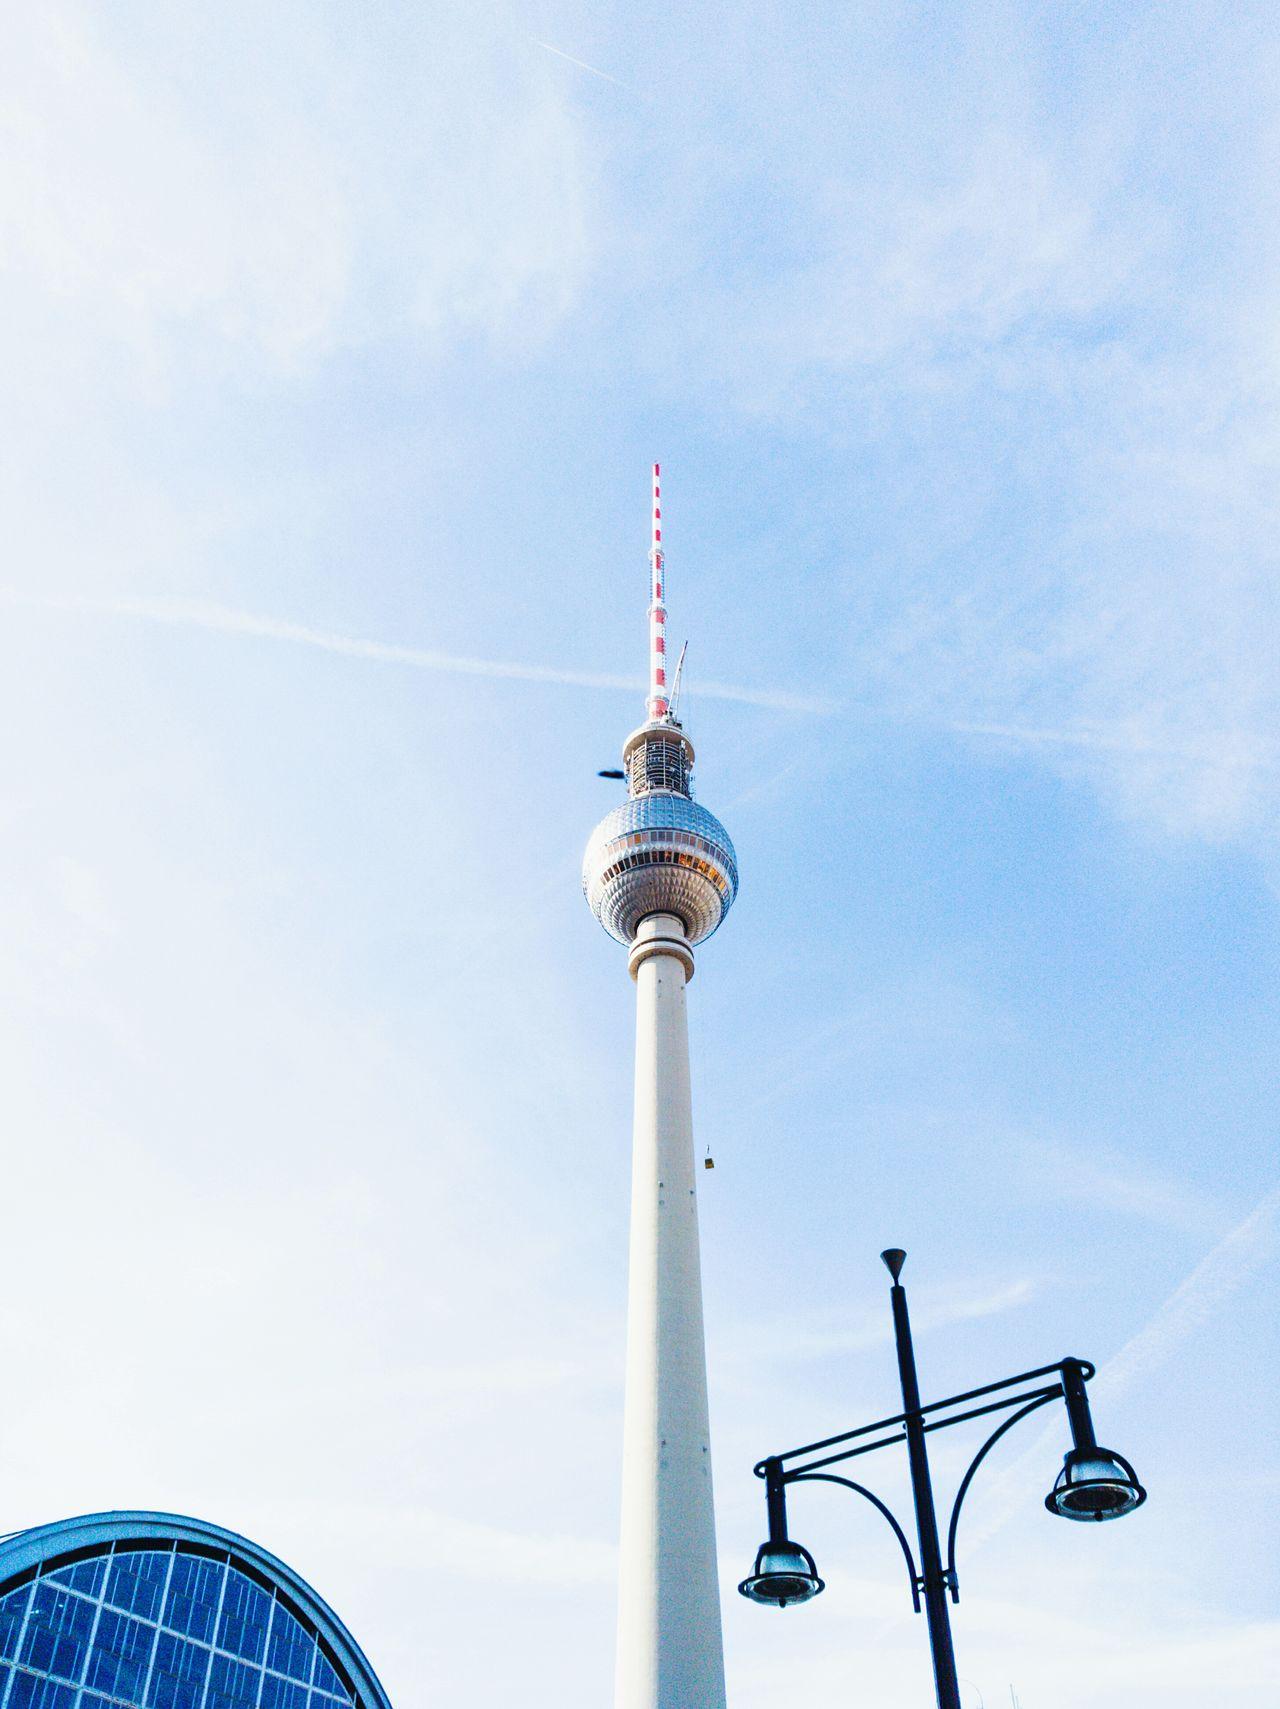 Tv Tower Berlin Berliner Ansichten Fernsehturm TV Tower Enjoying The Sun Berlin Mitte Berlin Architecture Cityscapes Travel Destinations Tourist Attraction  Minimalist Architecture Neighborhood Map